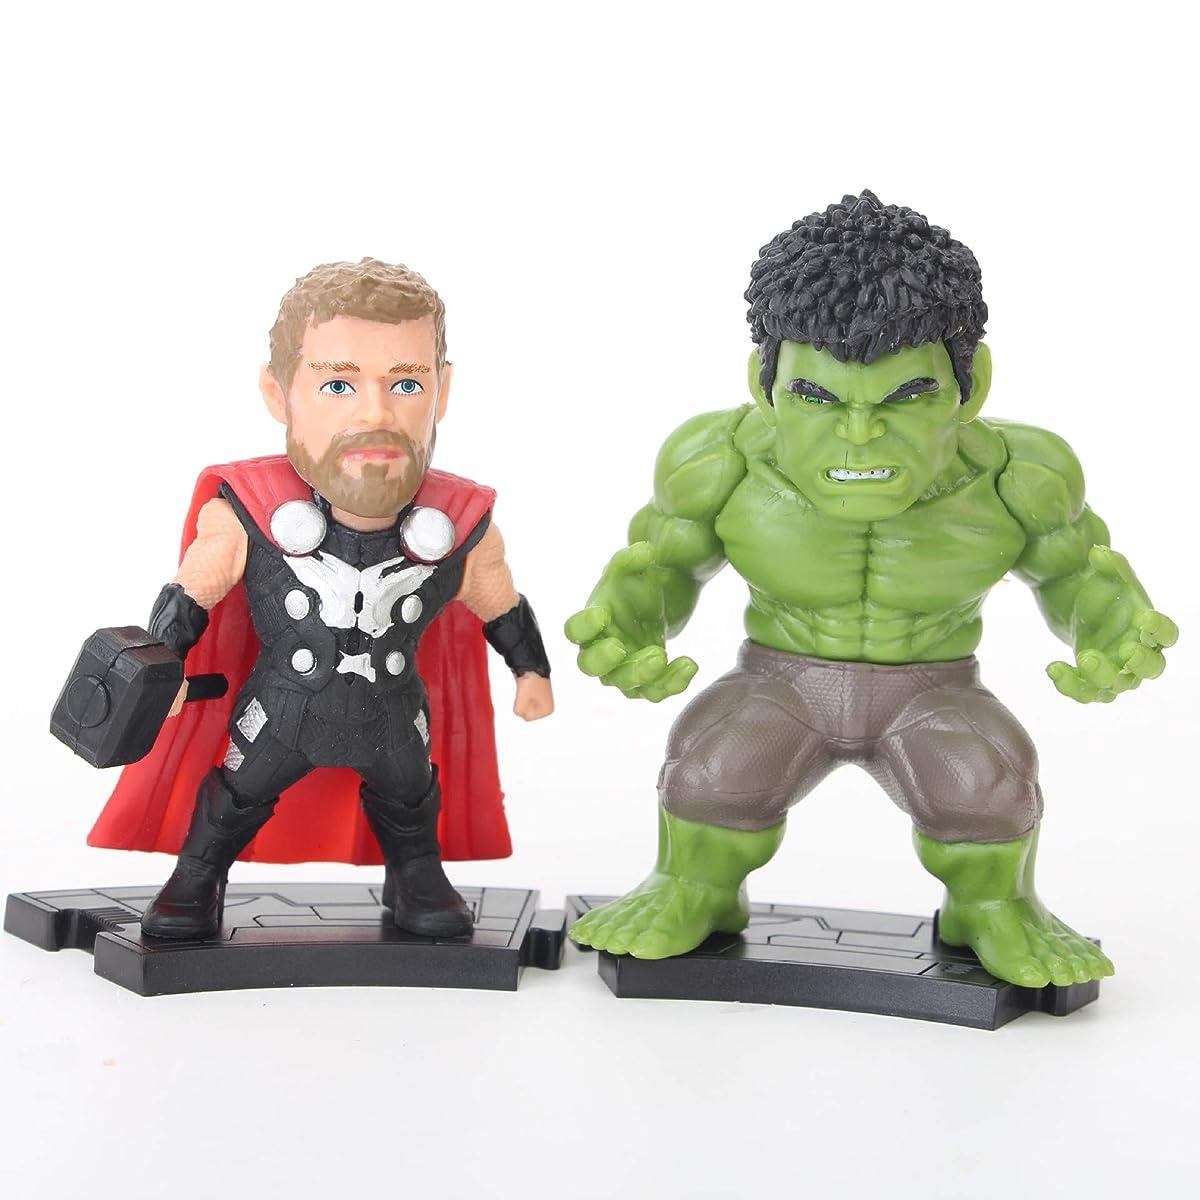 ATII Super Hero Adventures Ultimate Super Hero Set, 16 Figures from Avengers (Avengers: Infinity War)